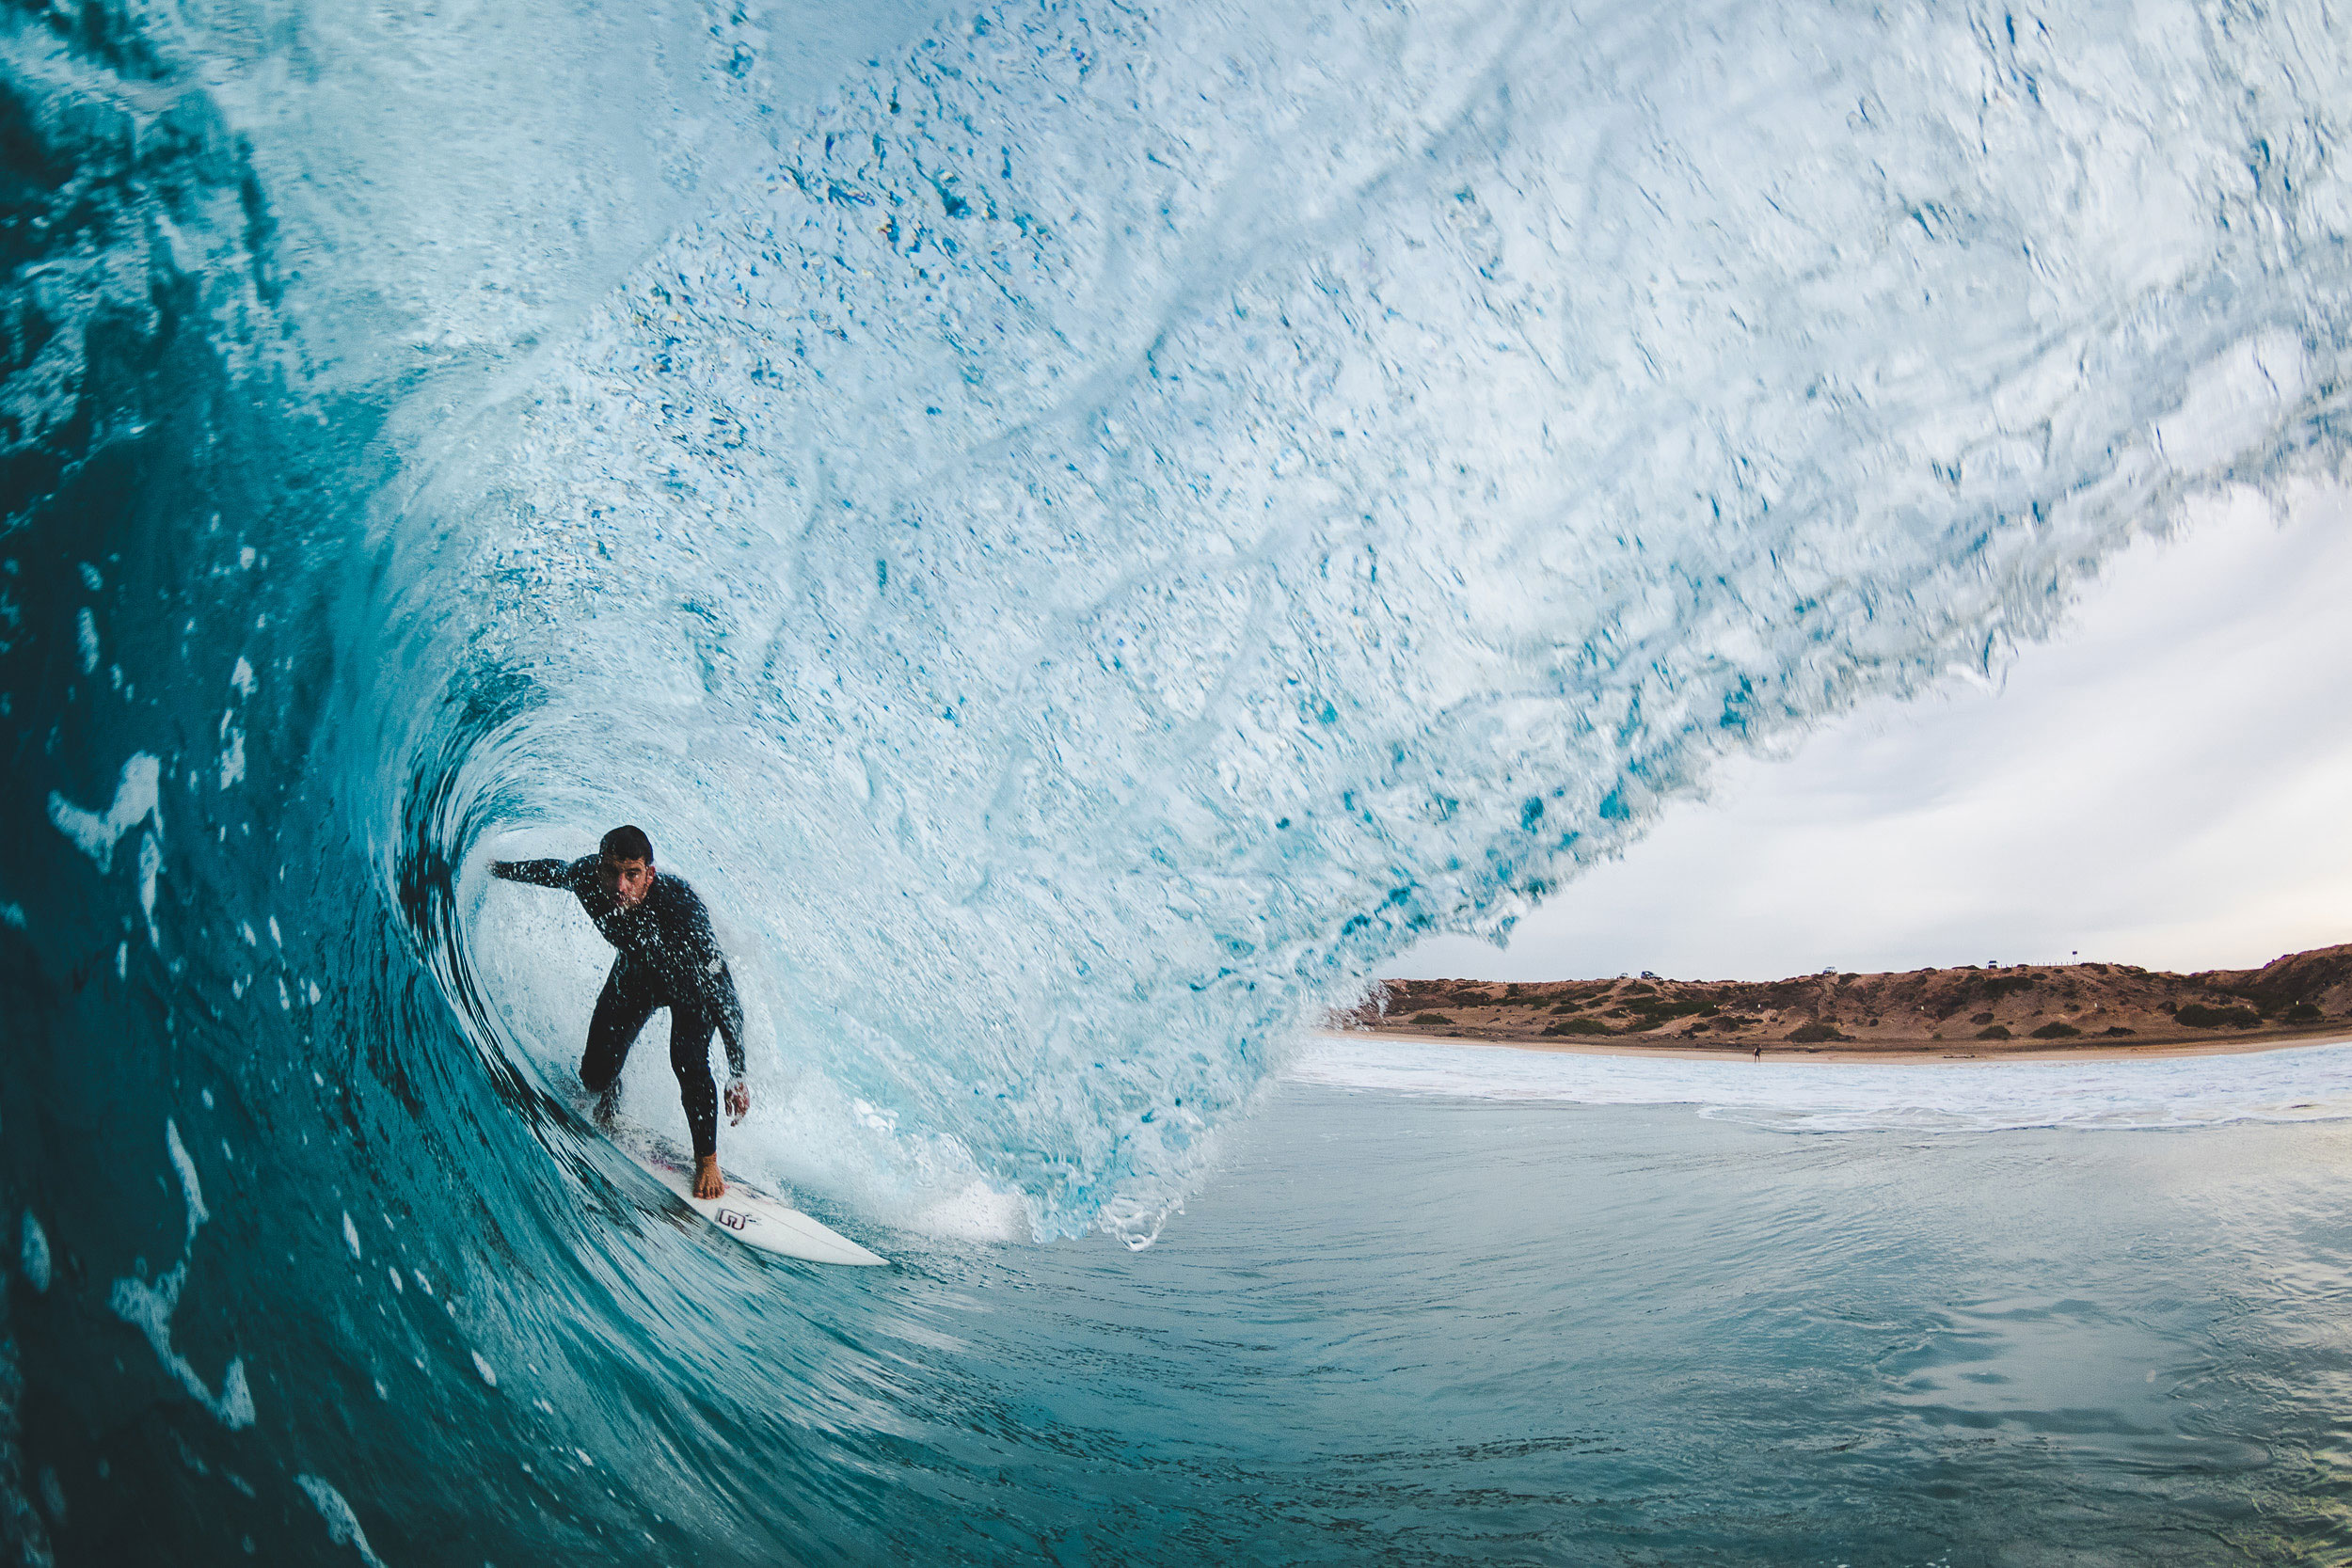 surf-15-copy.jpg